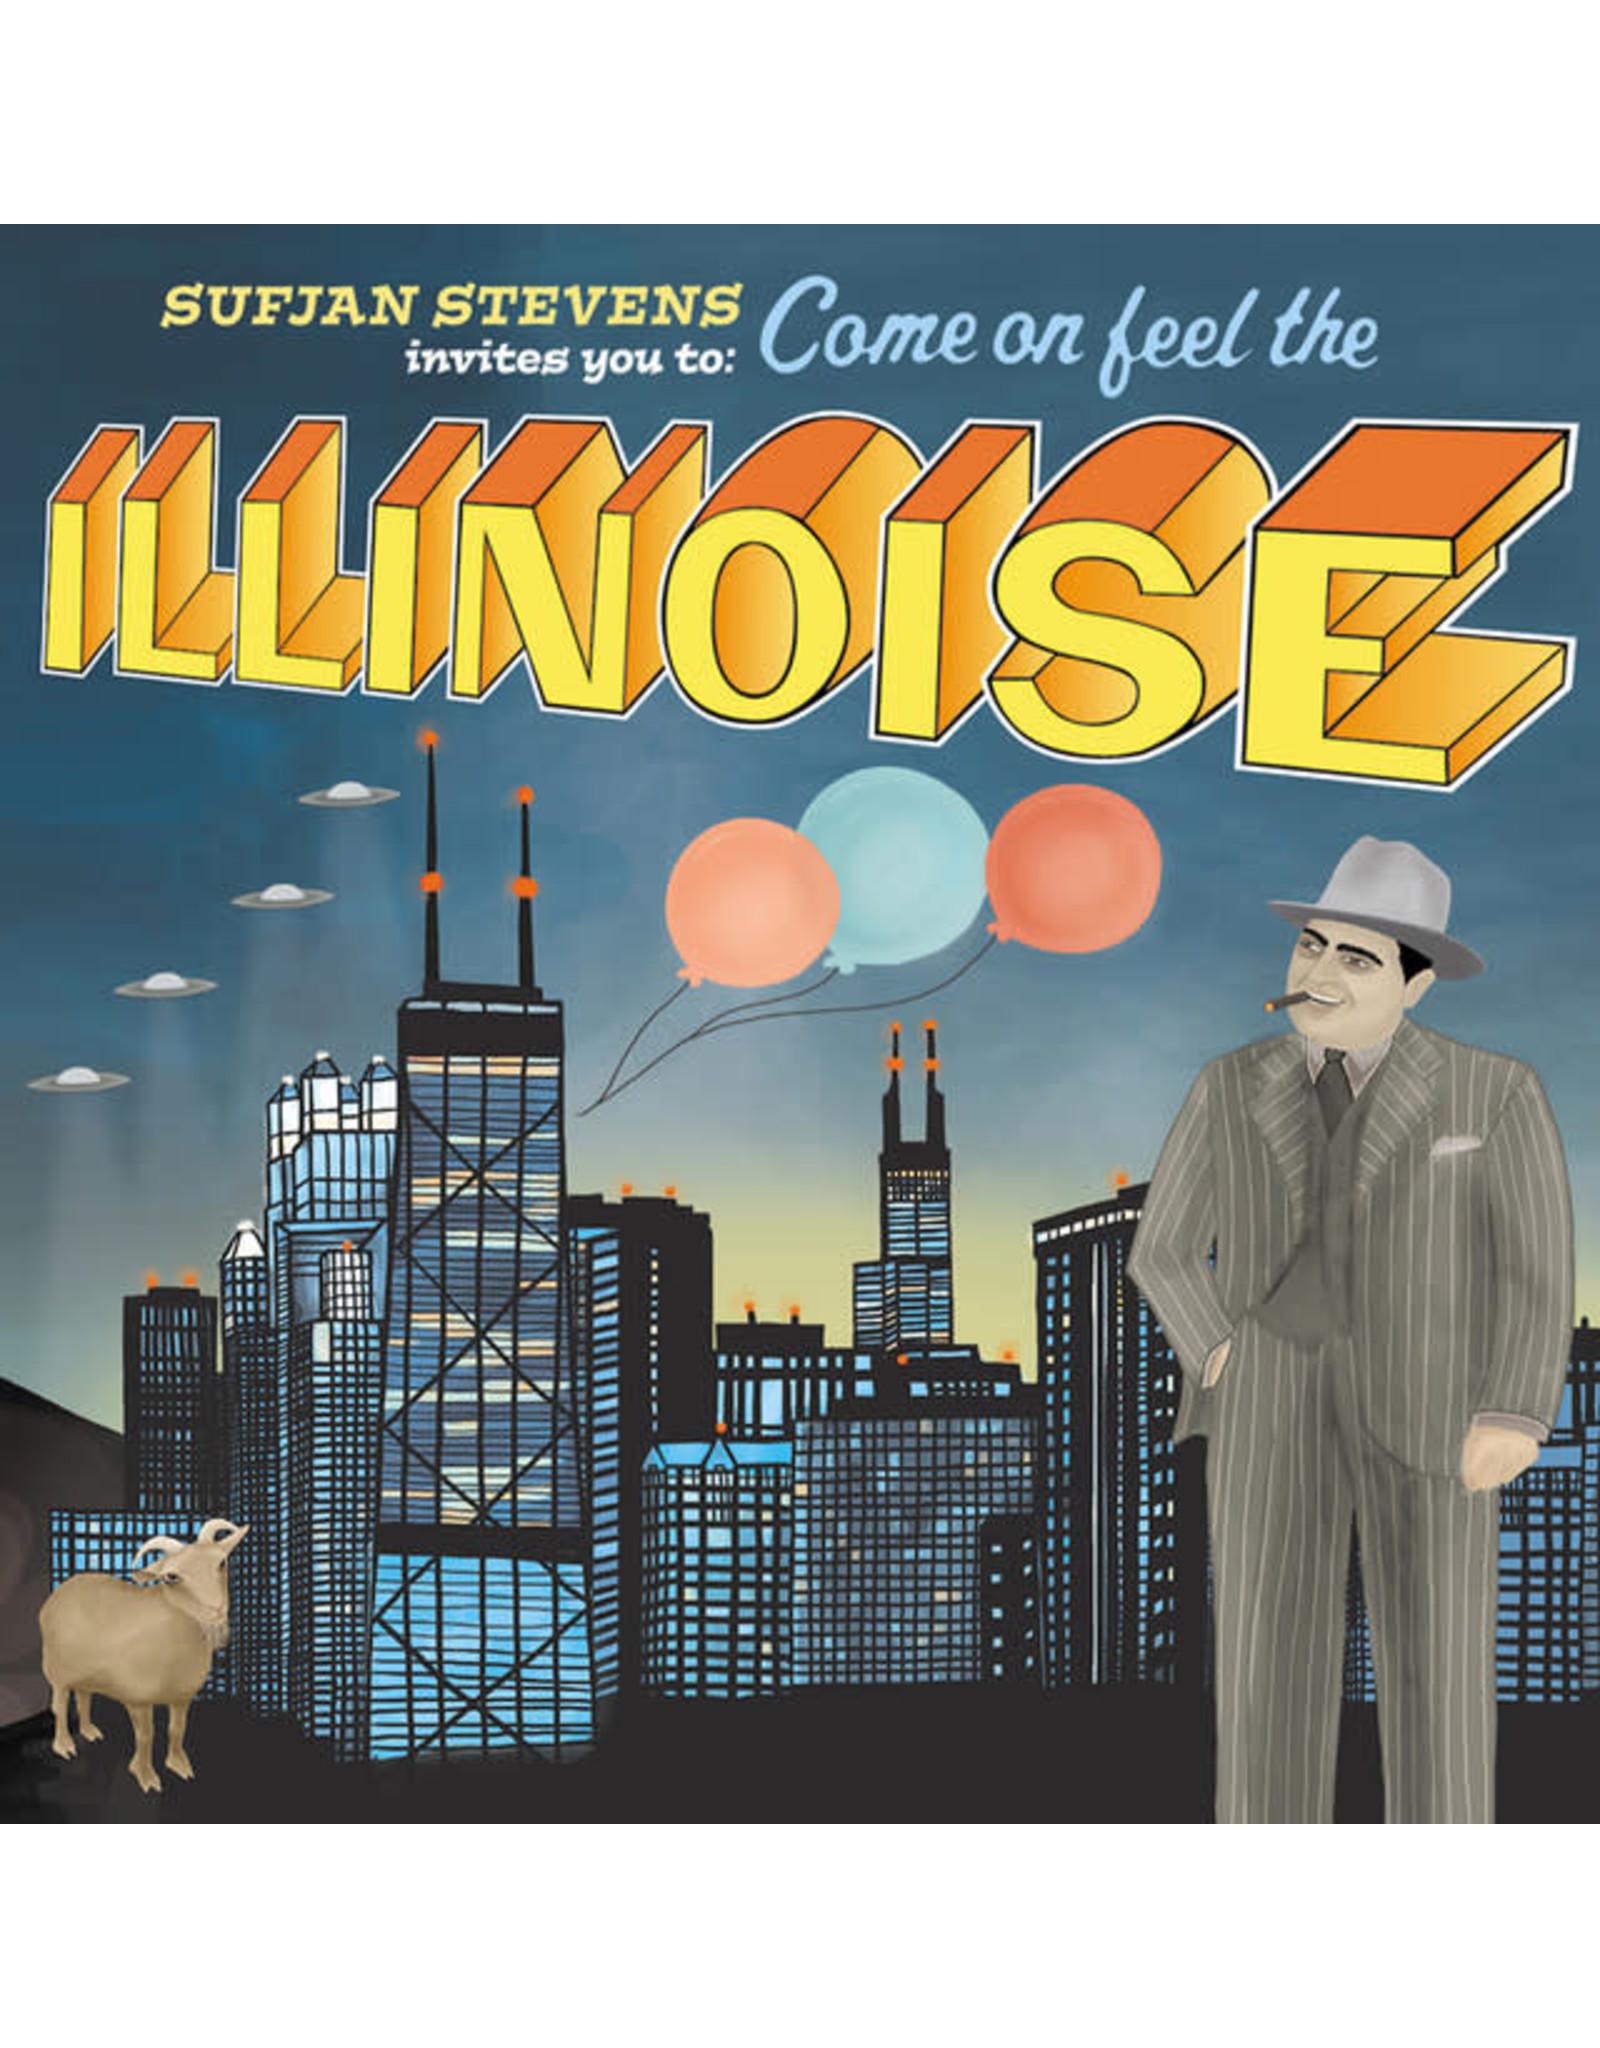 Vinyl Sufjan Stevens - Illinoise